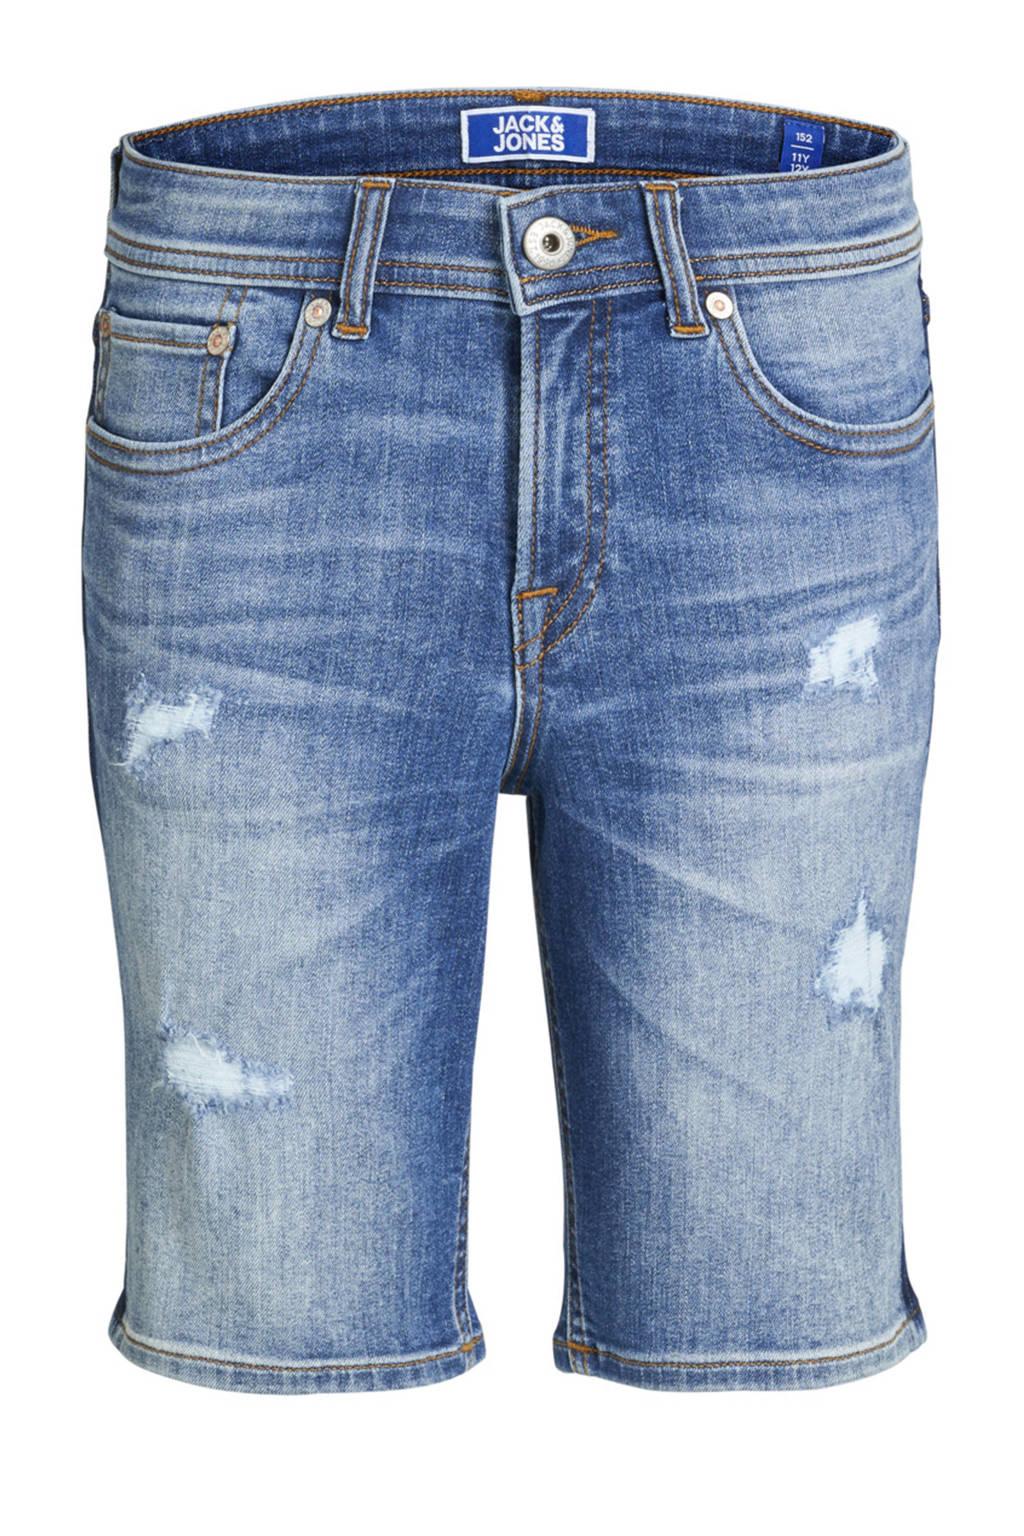 Jack & Jones Junior jeans bermuda Rick met slijtage details, Stonewashed